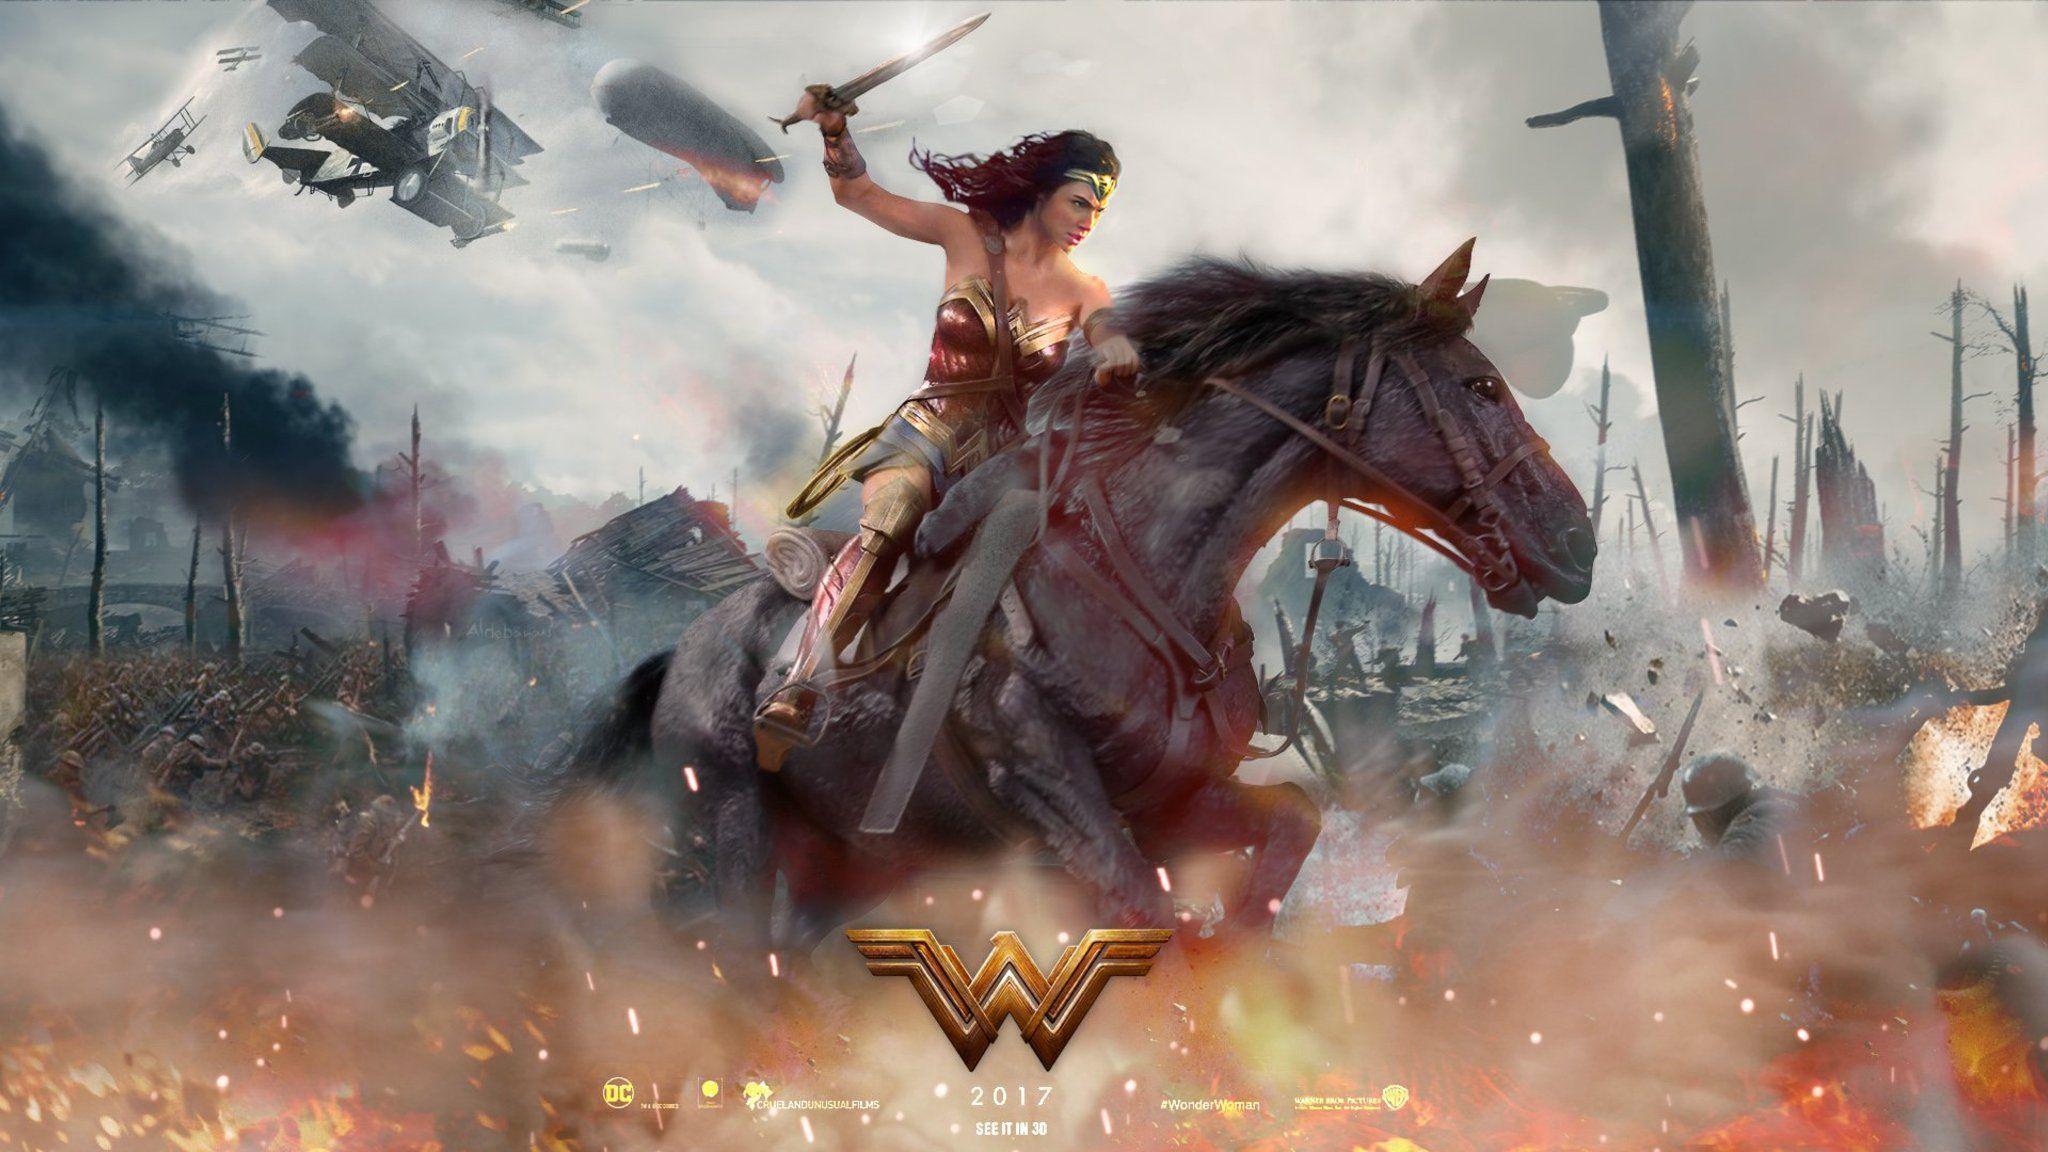 Wonder Woman Hq Movie Wallpapers: Wonder Woman 2017 Wallpapers